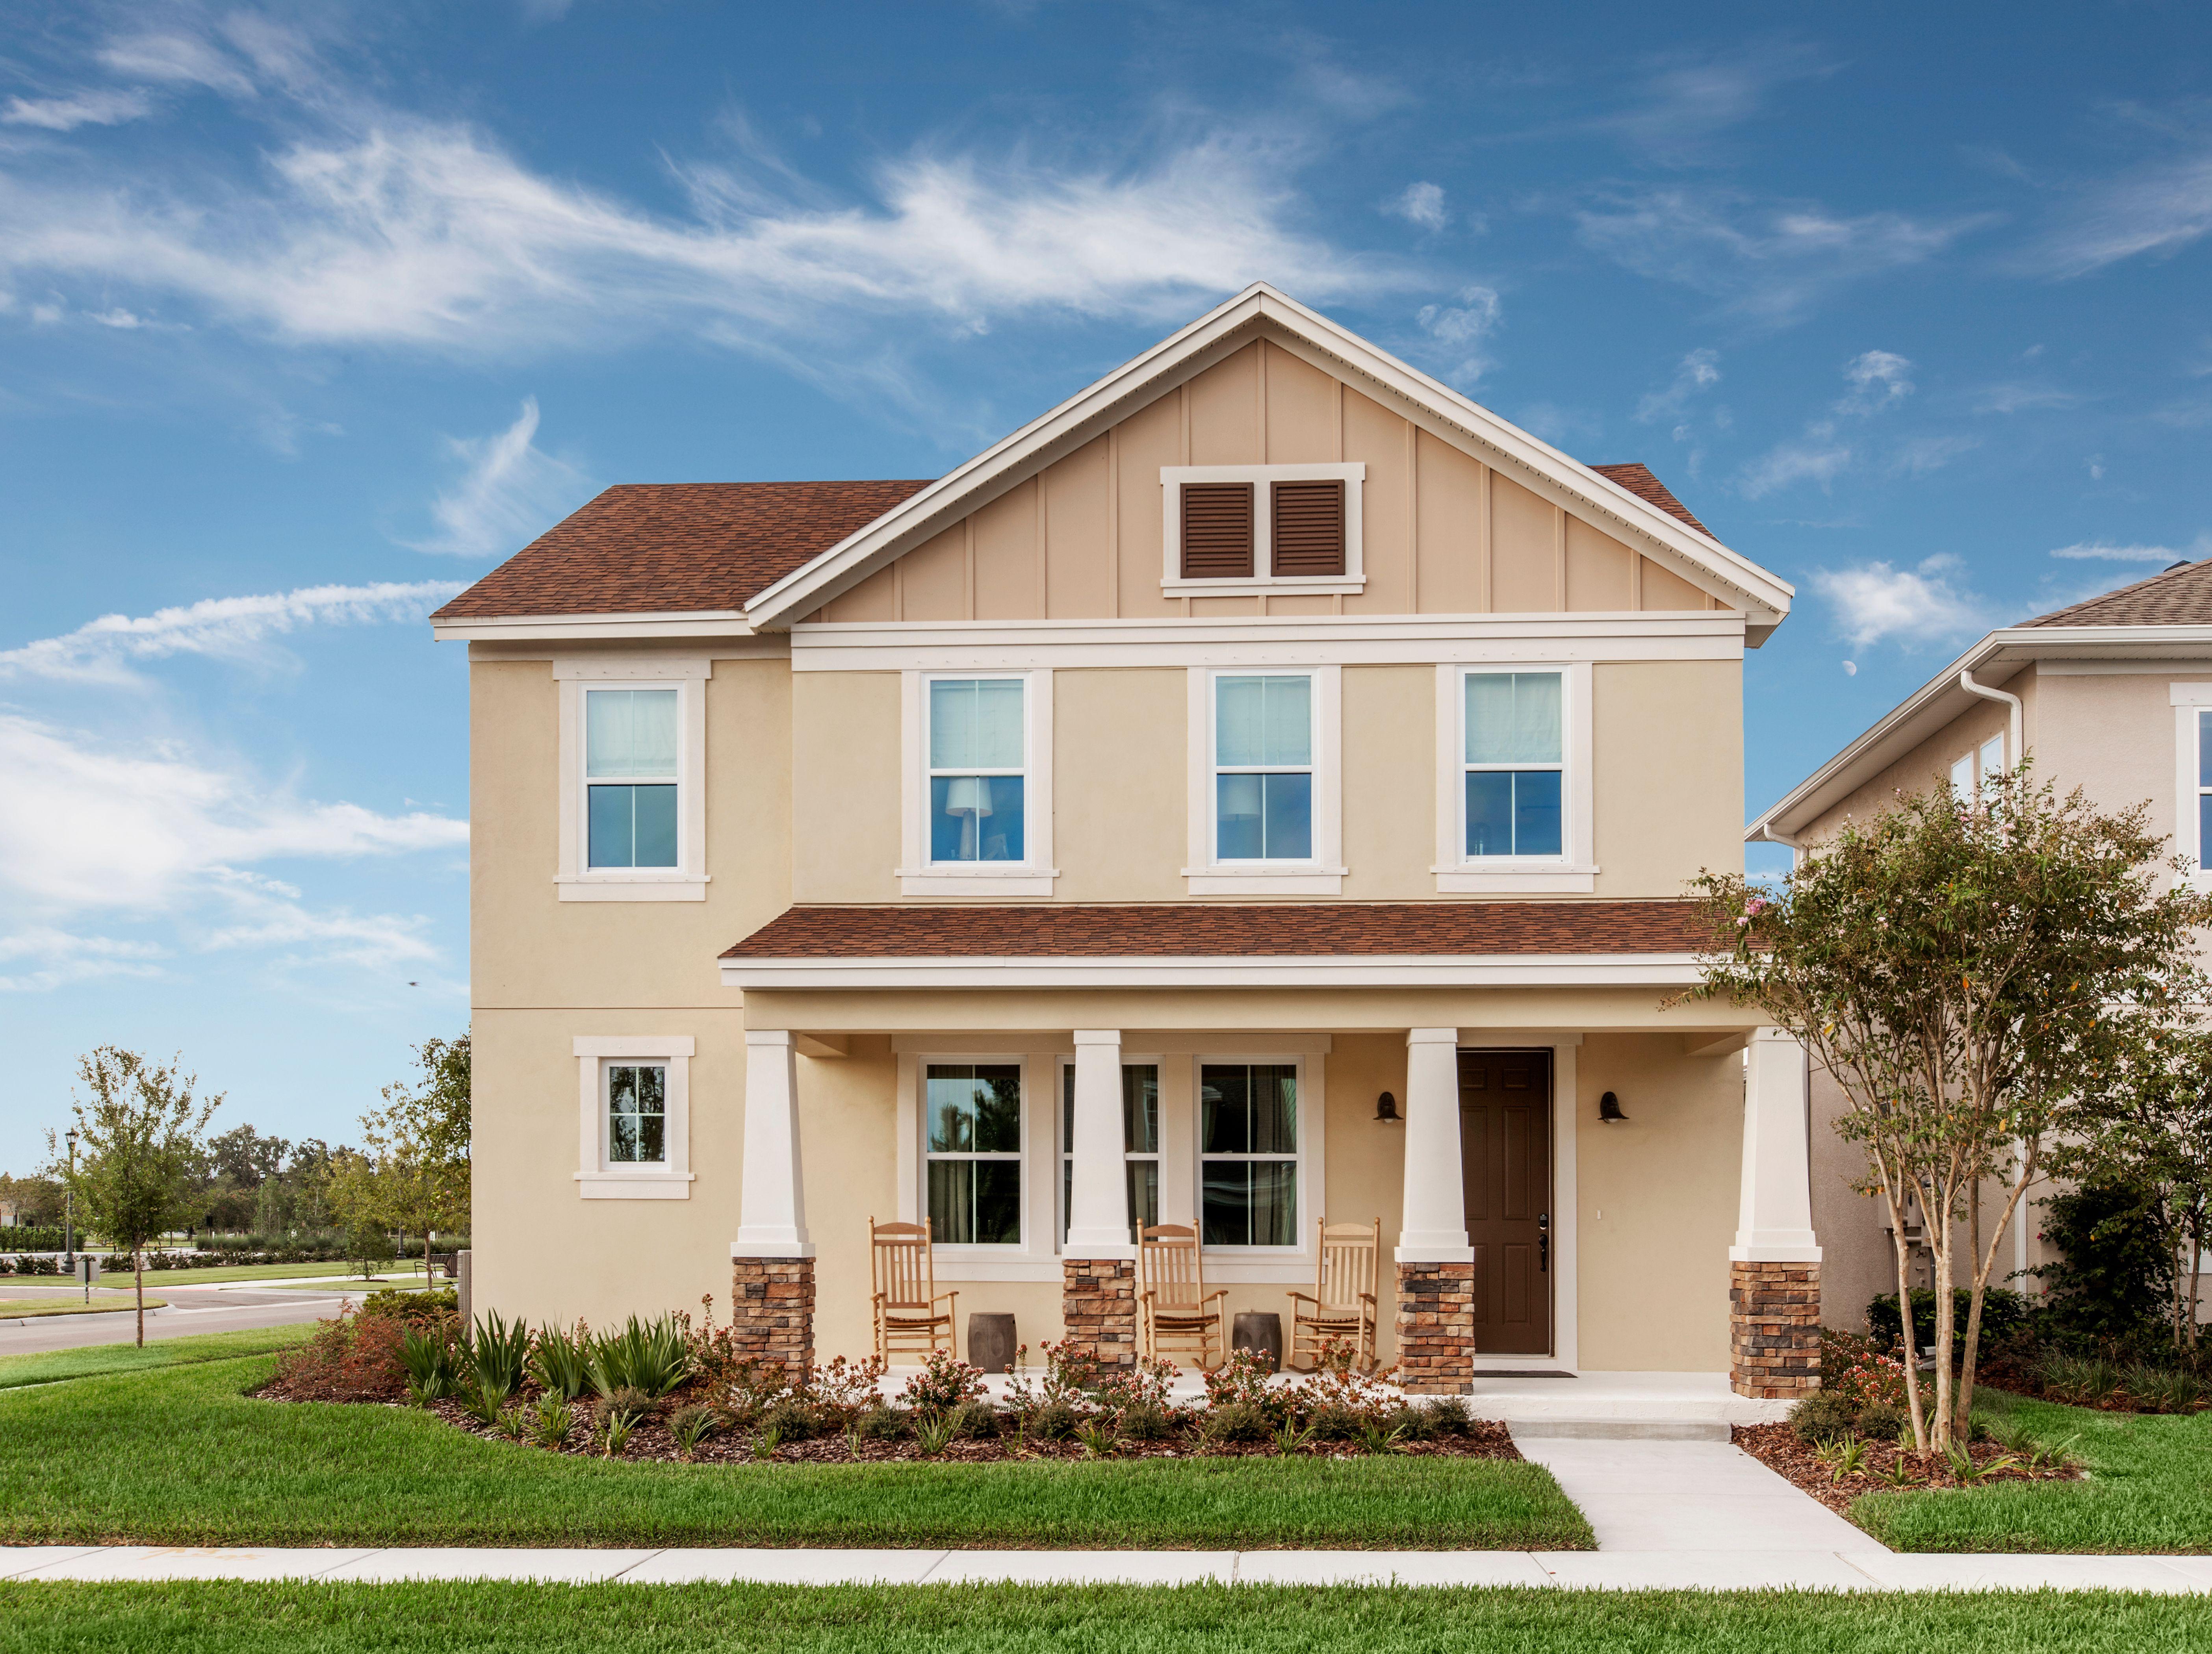 2725 verona lane odessa fl new home for sale